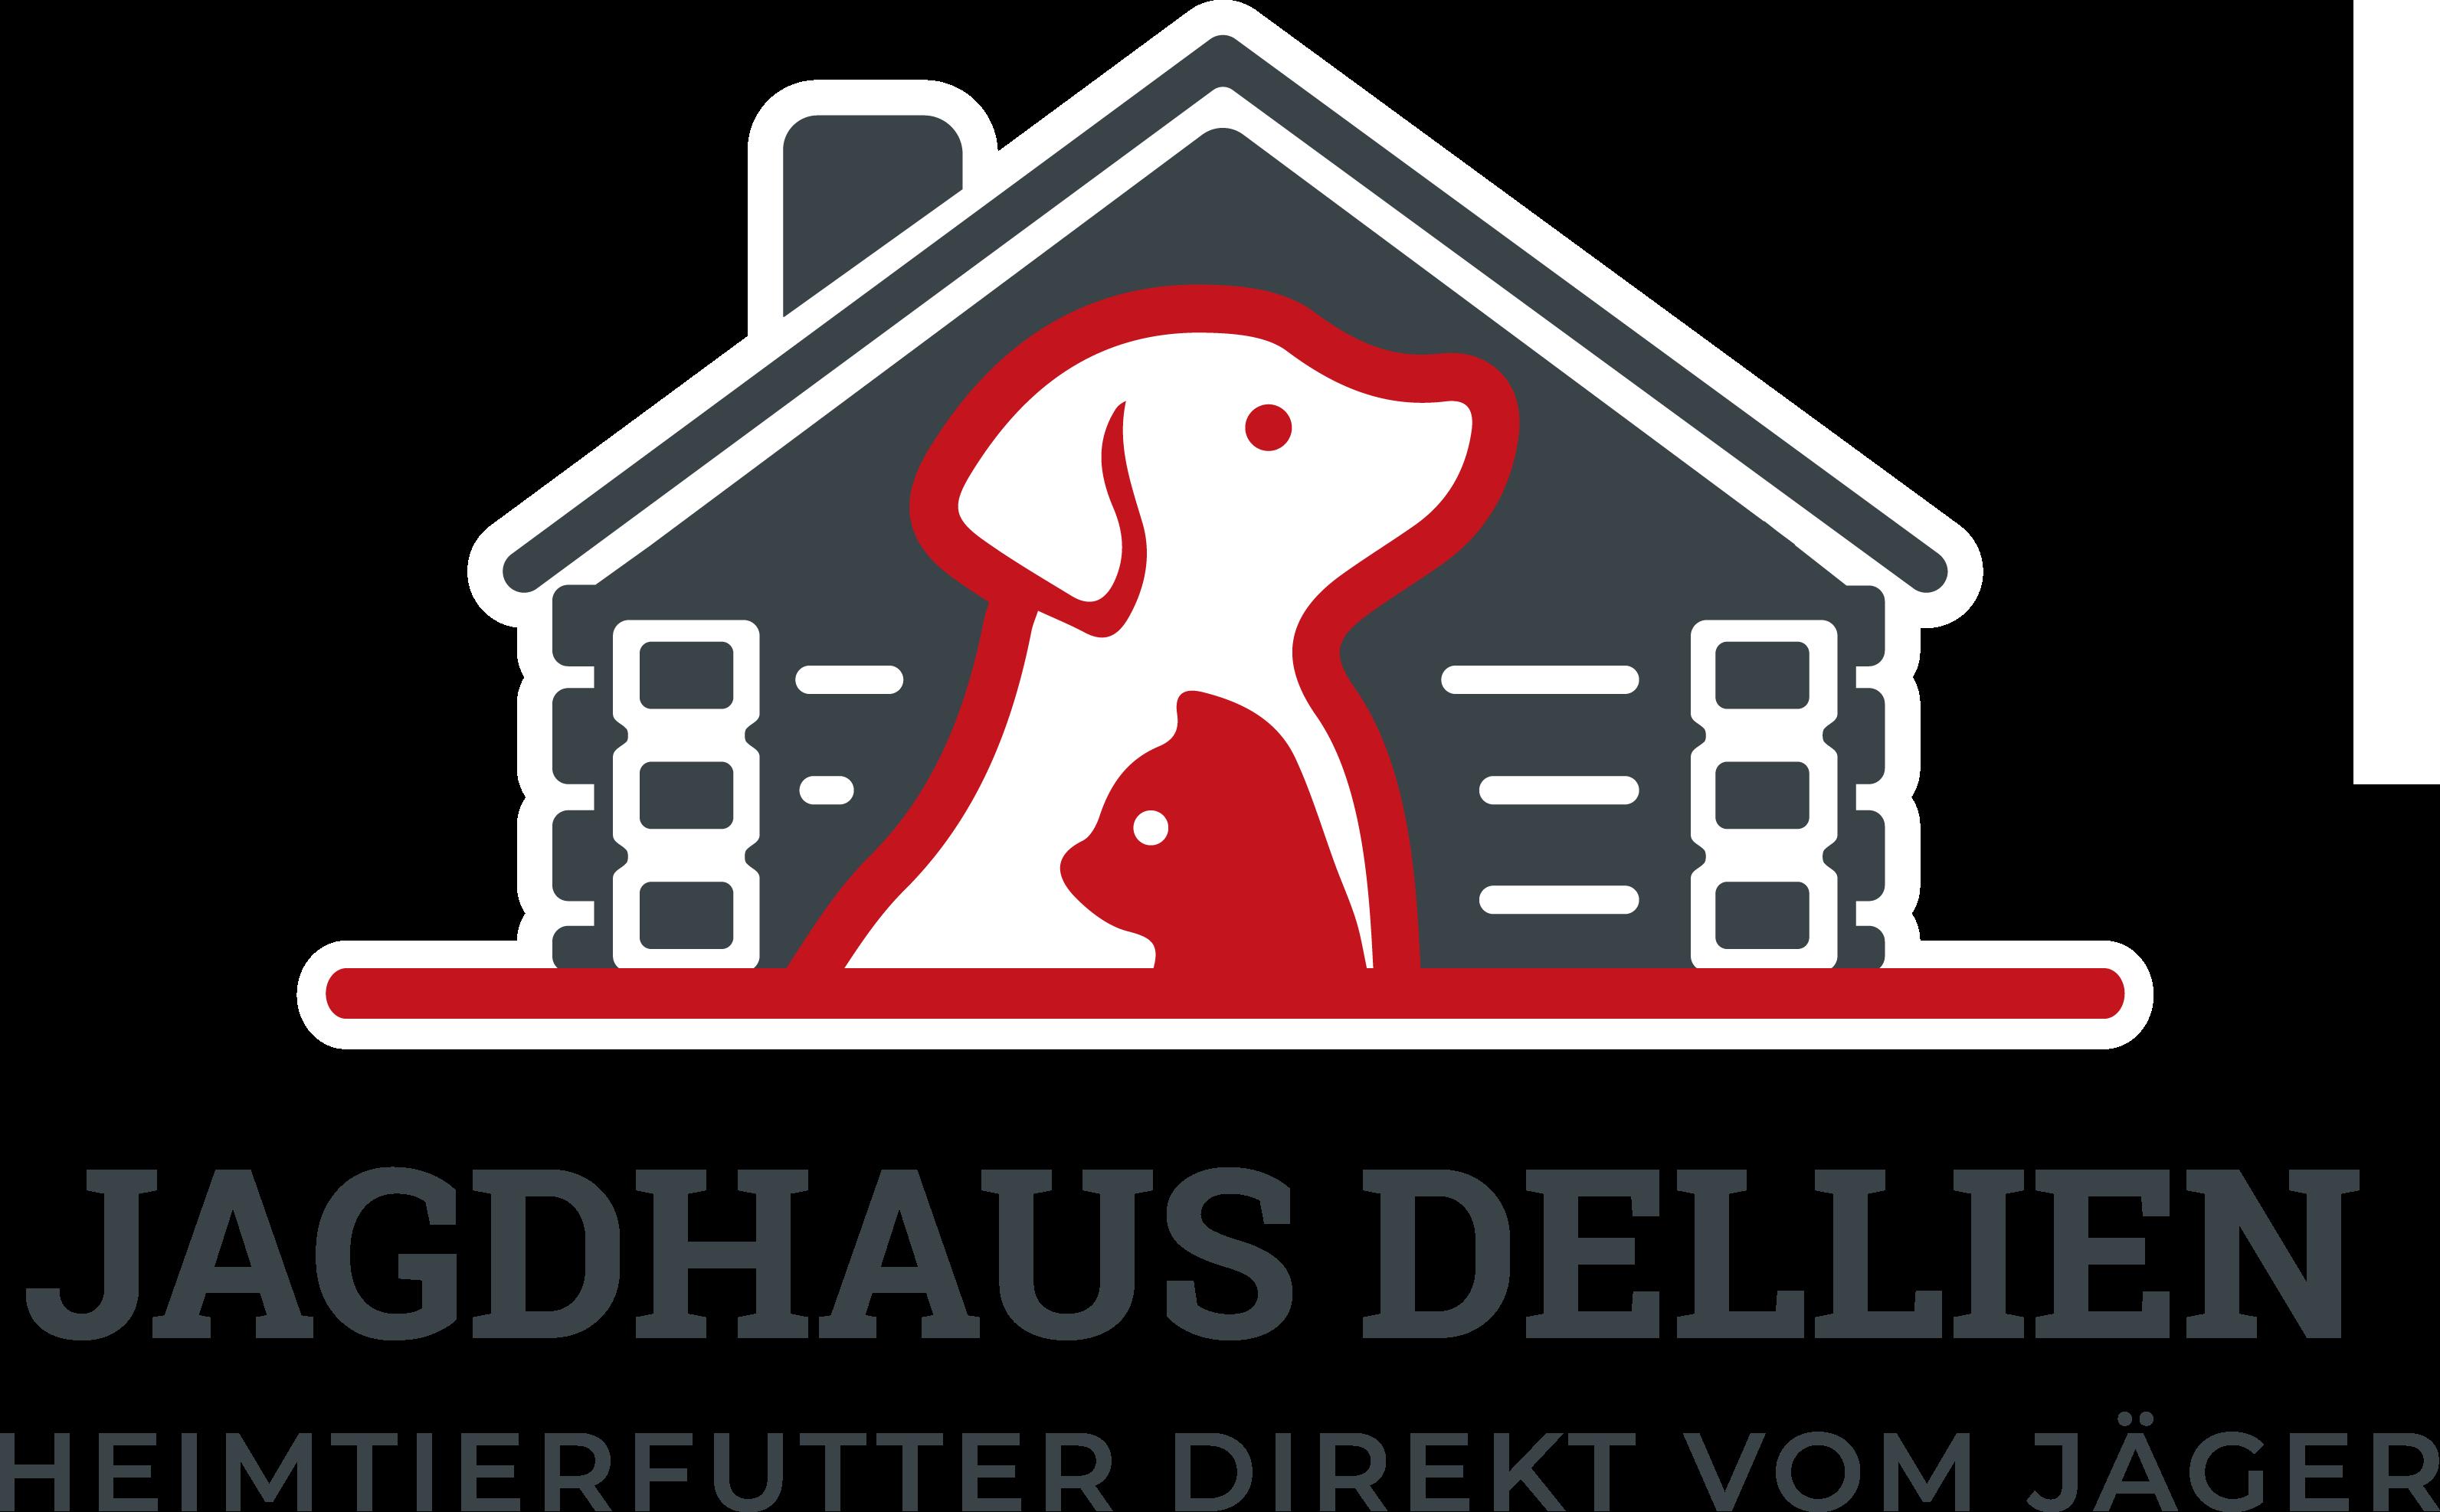 BARF Shop Jagdhaus Dellien